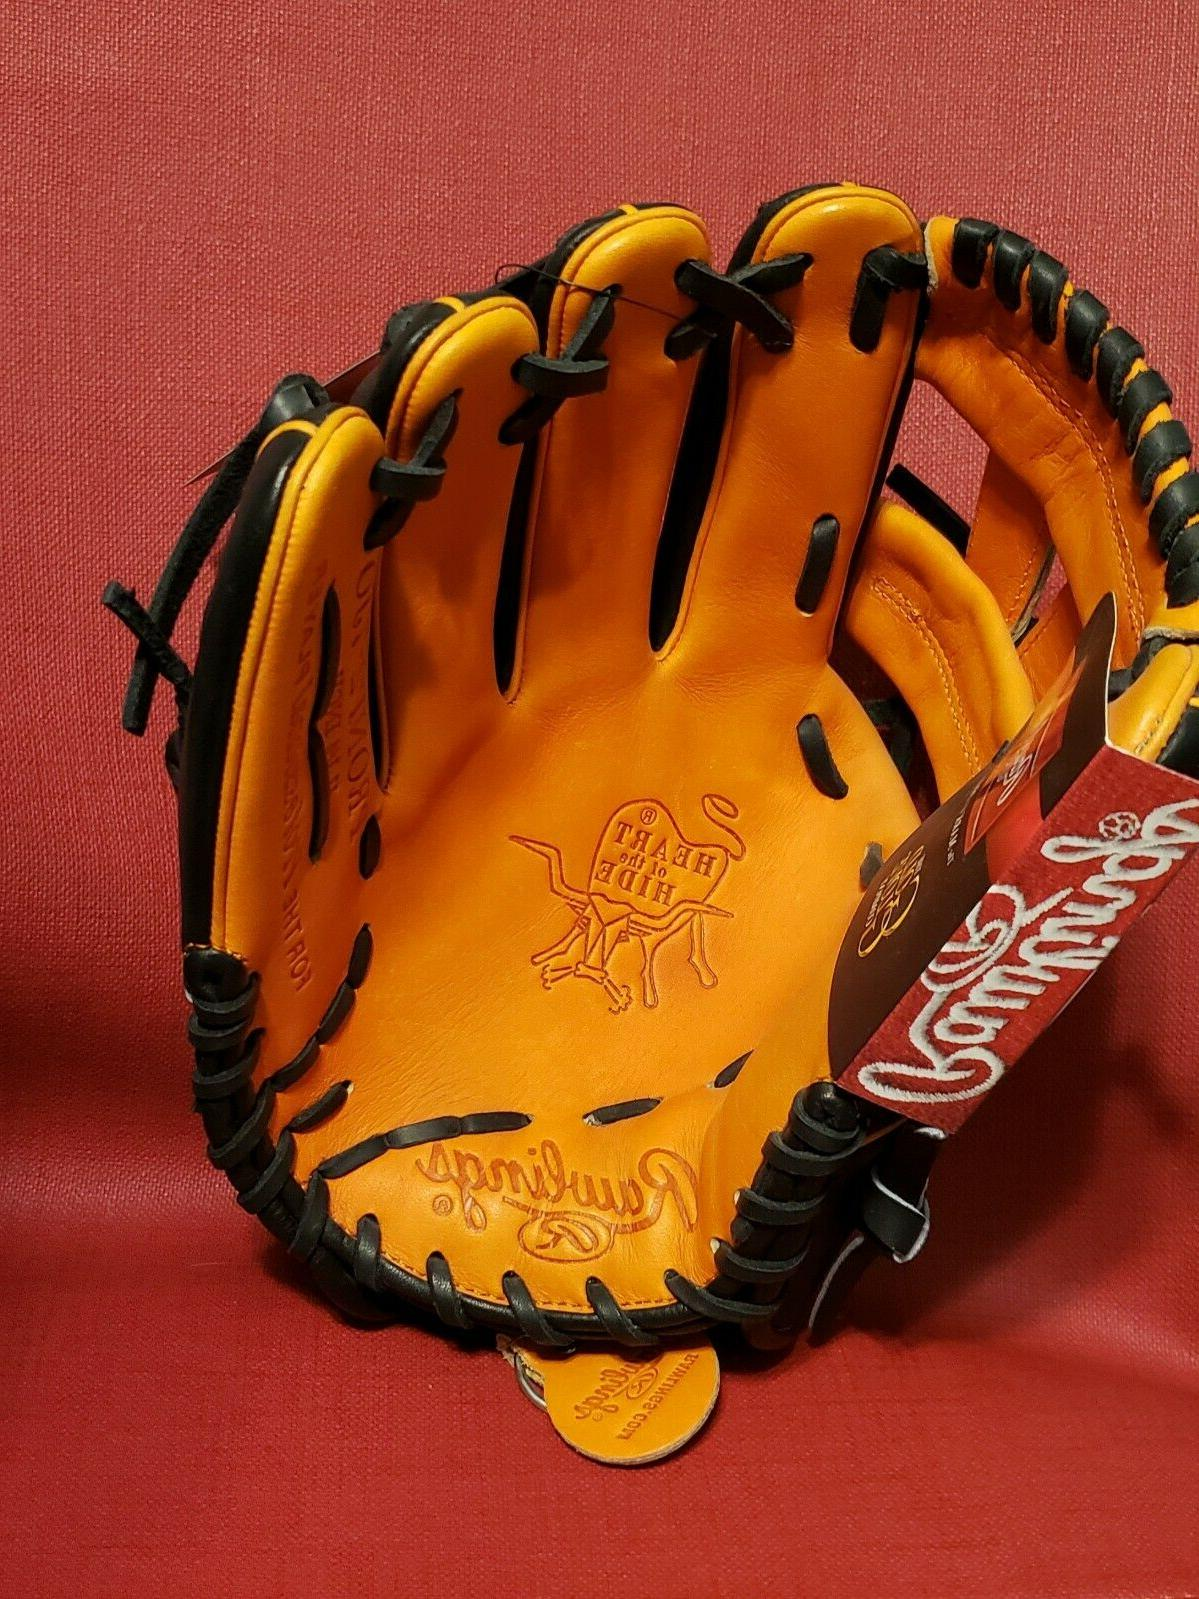 Rawlings PRONP2-7JO Heart the Hide Baseball Glove RHT